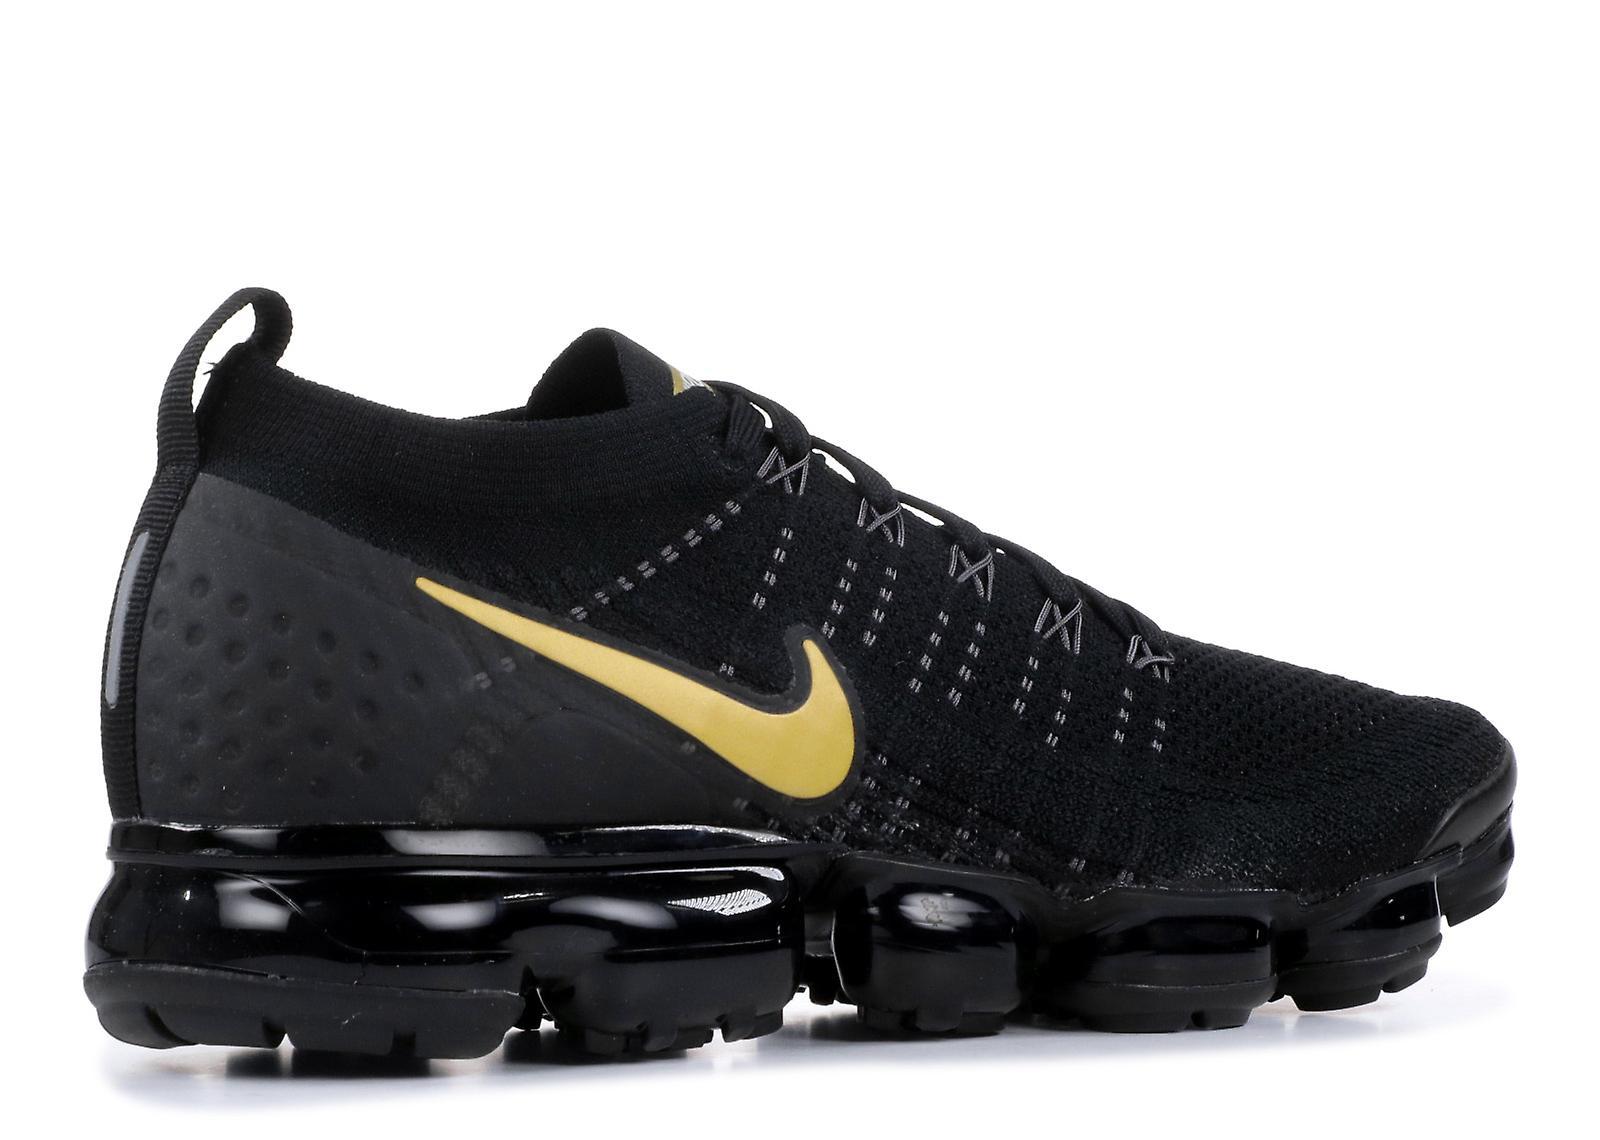 W Nike Air Vapormax Flyknit 2 - 942843 - 012 - sko